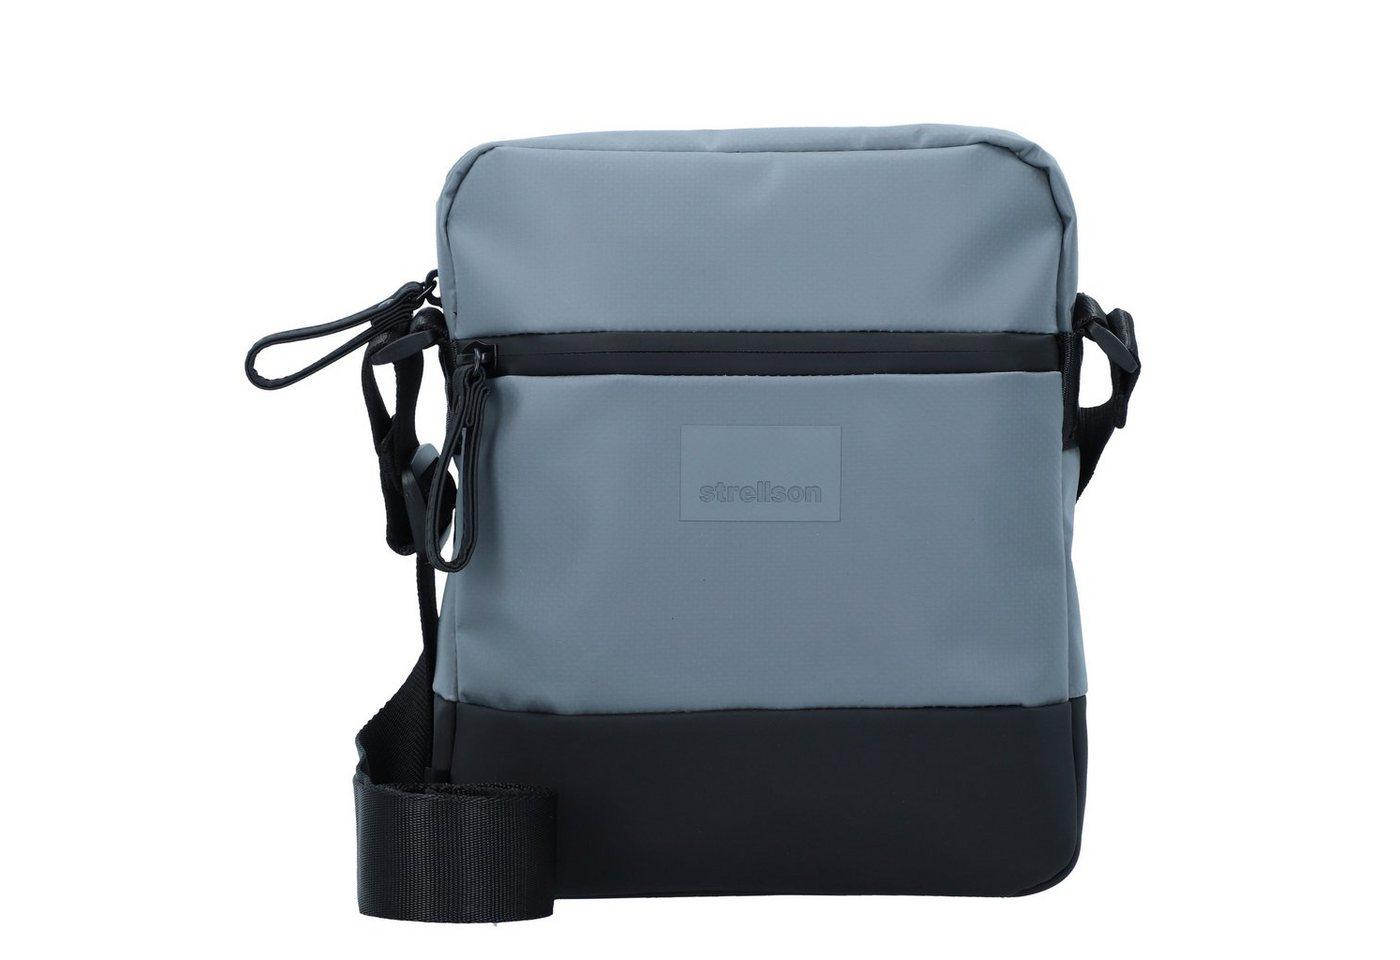 Strellson Stockwell Umhängetasche 20 cm | Taschen | Grau | Pvc | Strellson